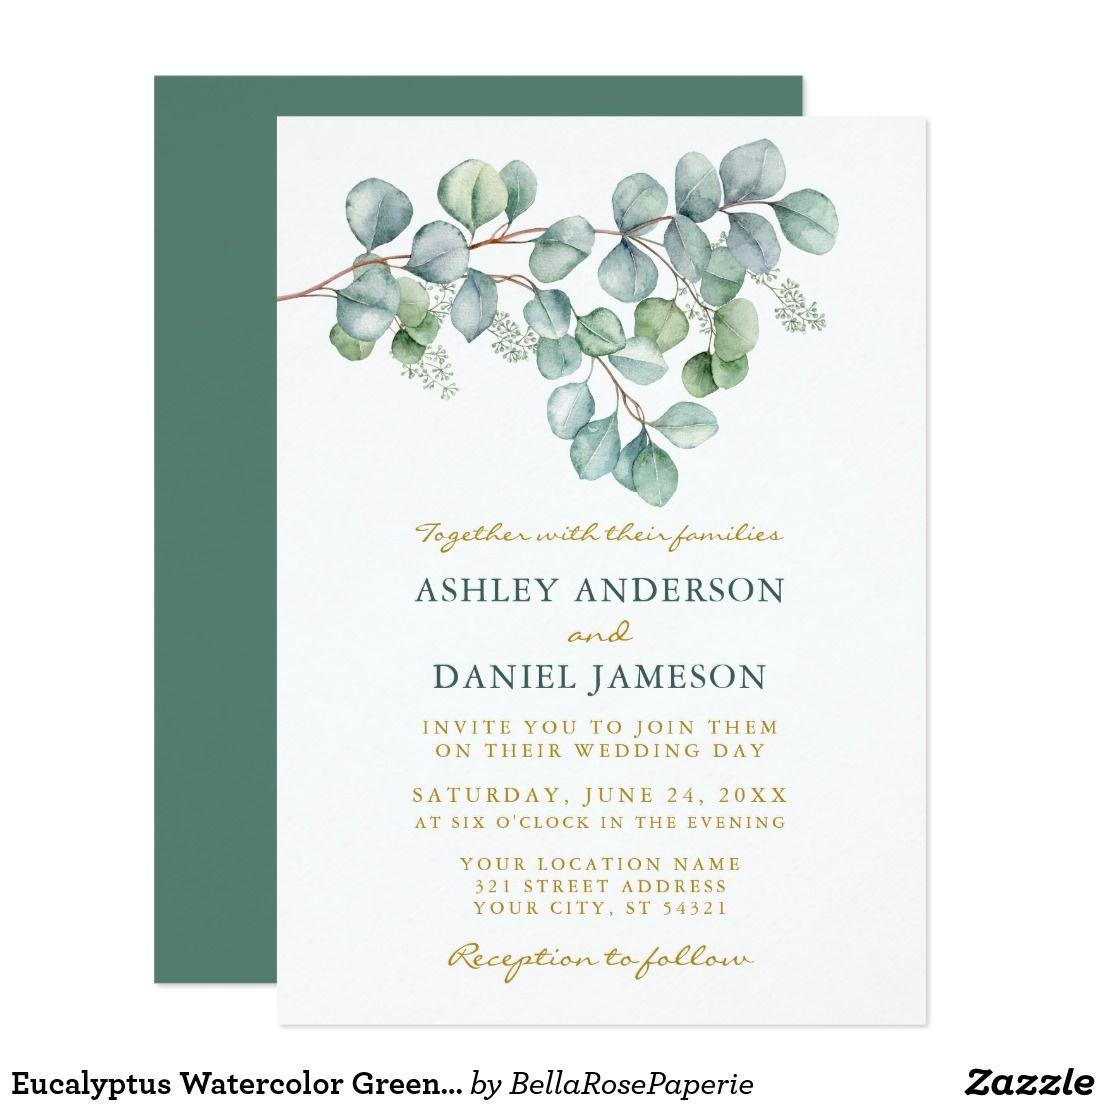 Eucalyptus watercolor greenery wedding gold invitation